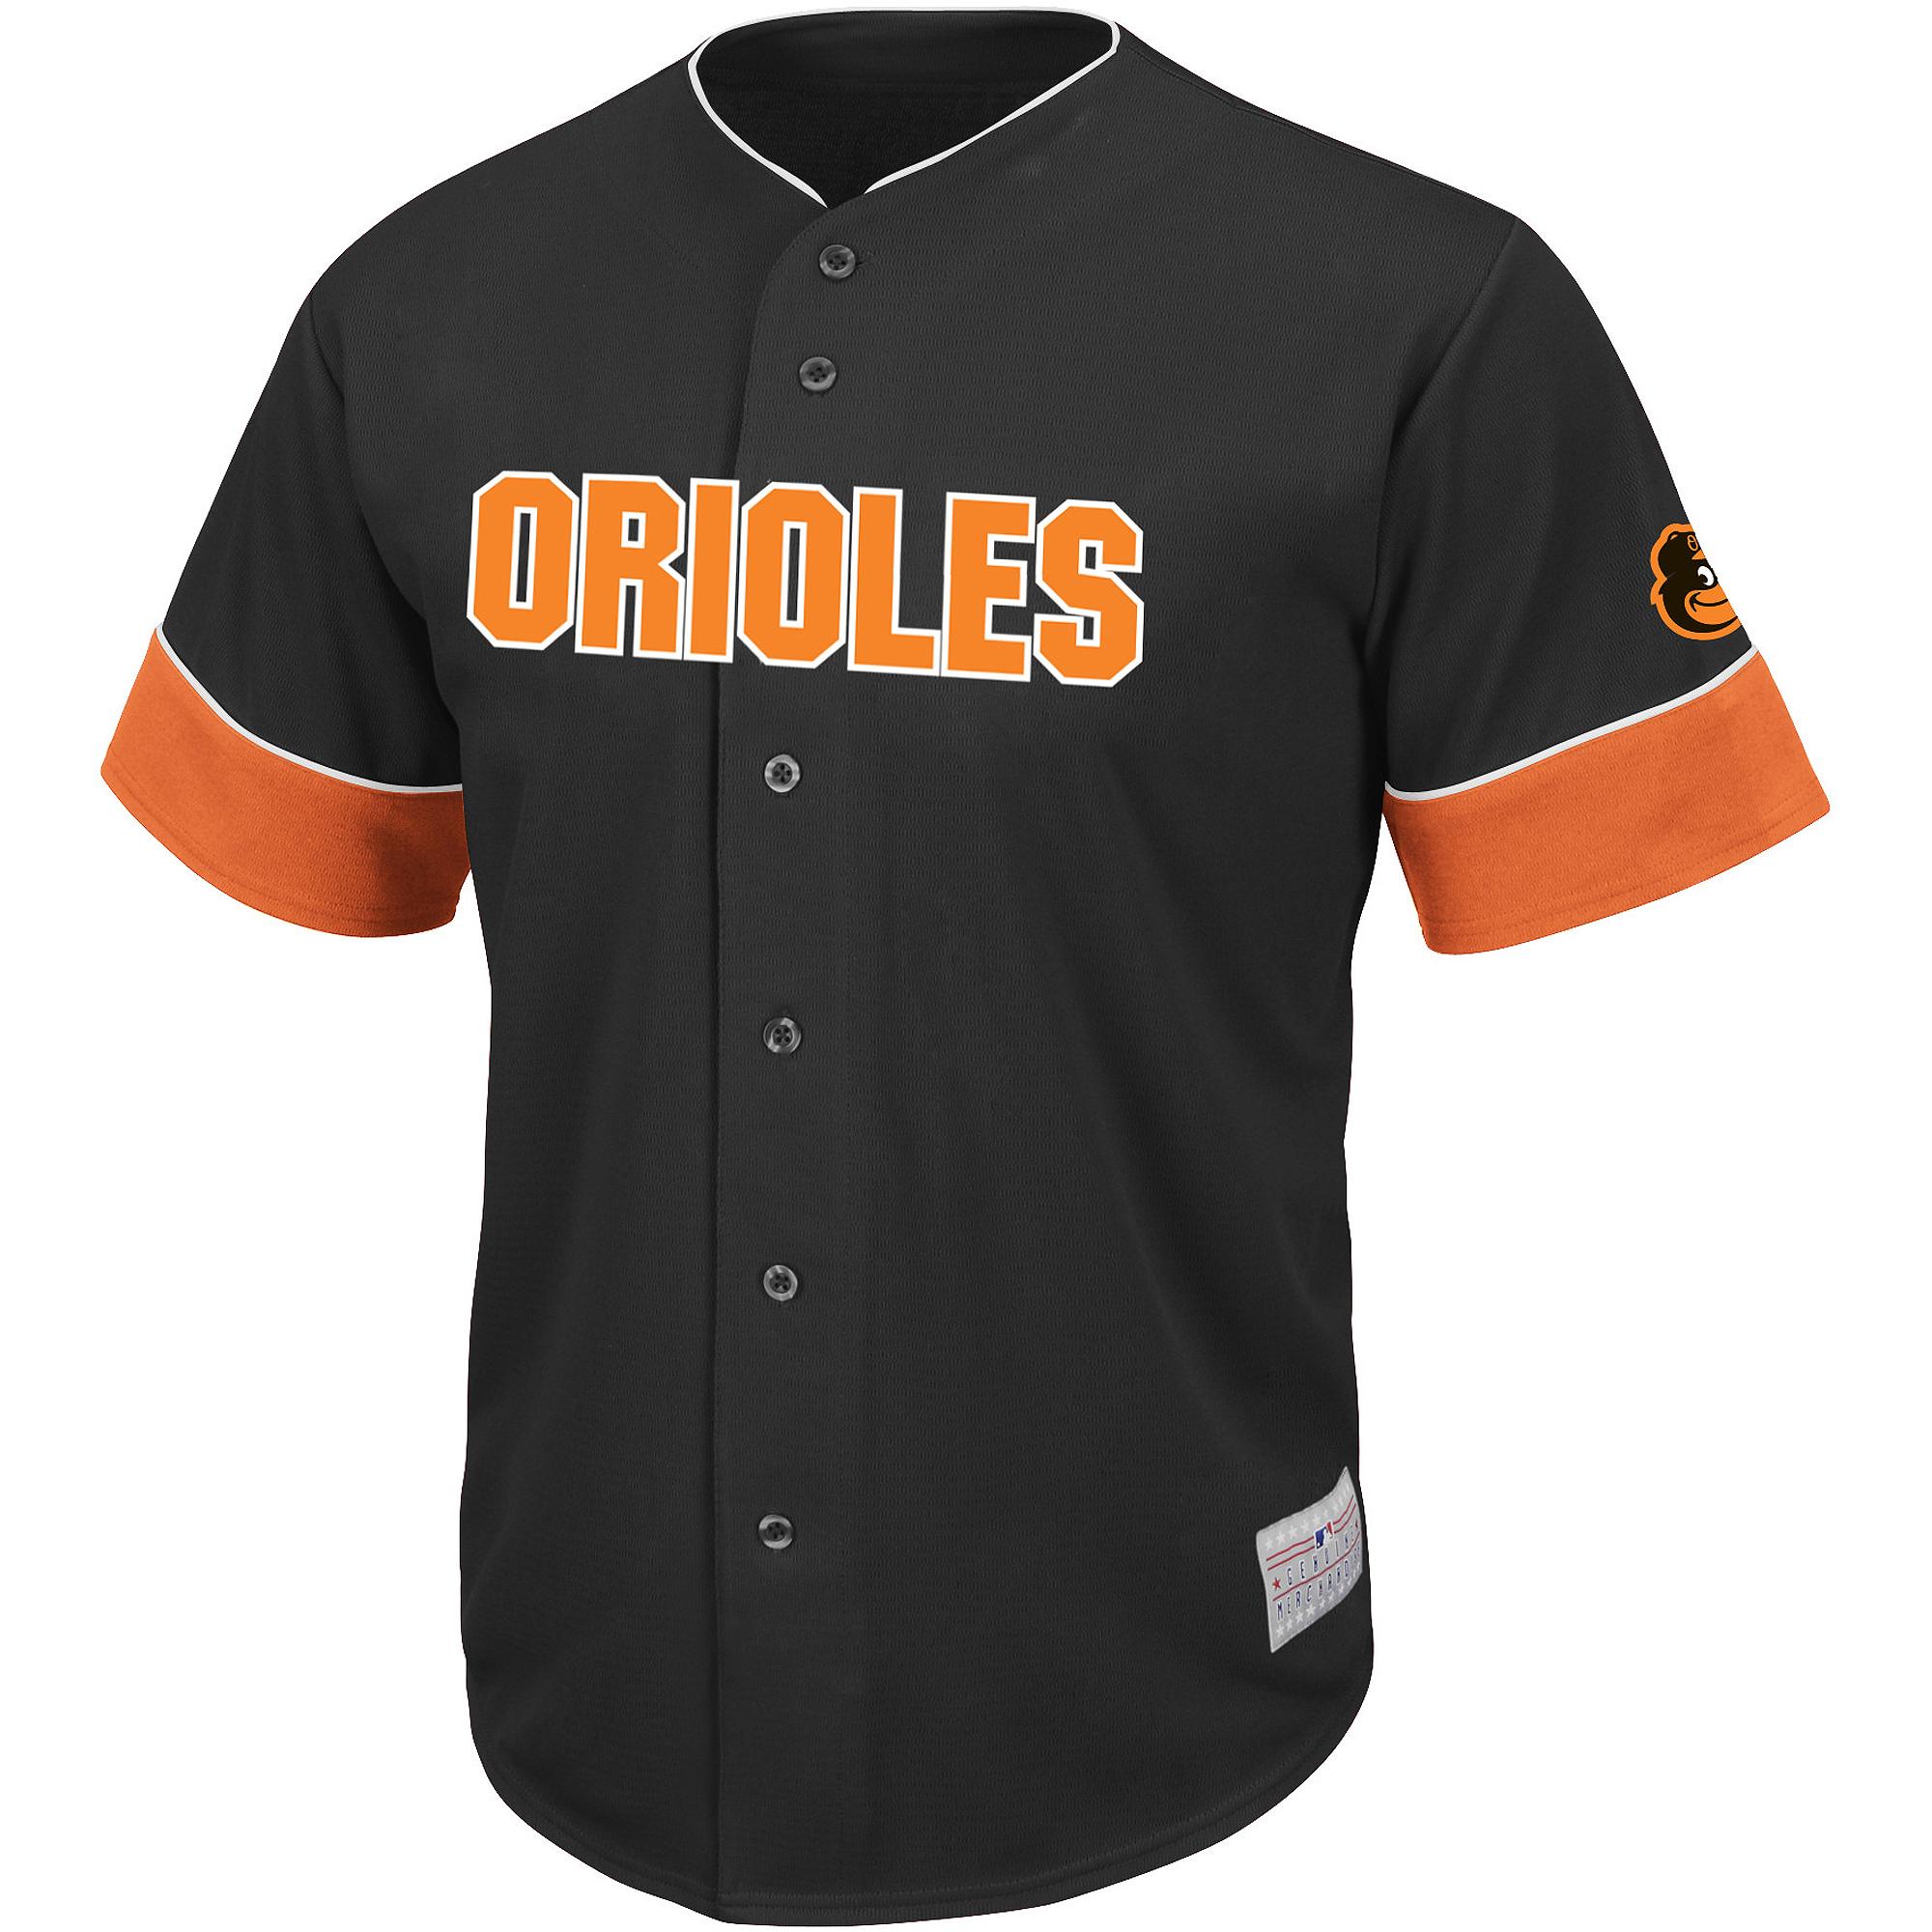 MLB Men's Baltimore Orioles Player Jersey